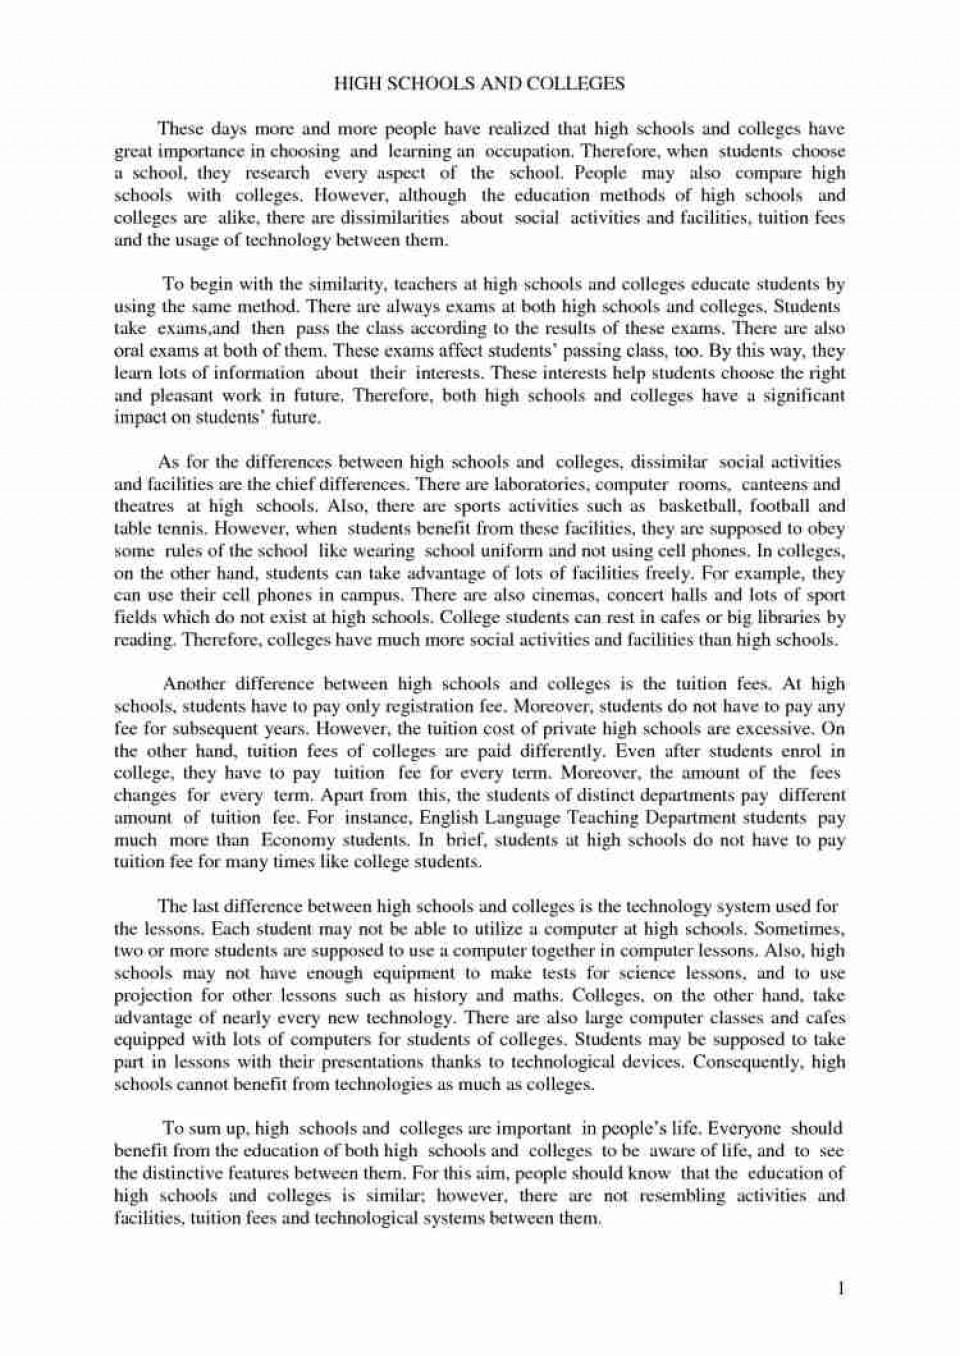 Professional masters essay writing service gb